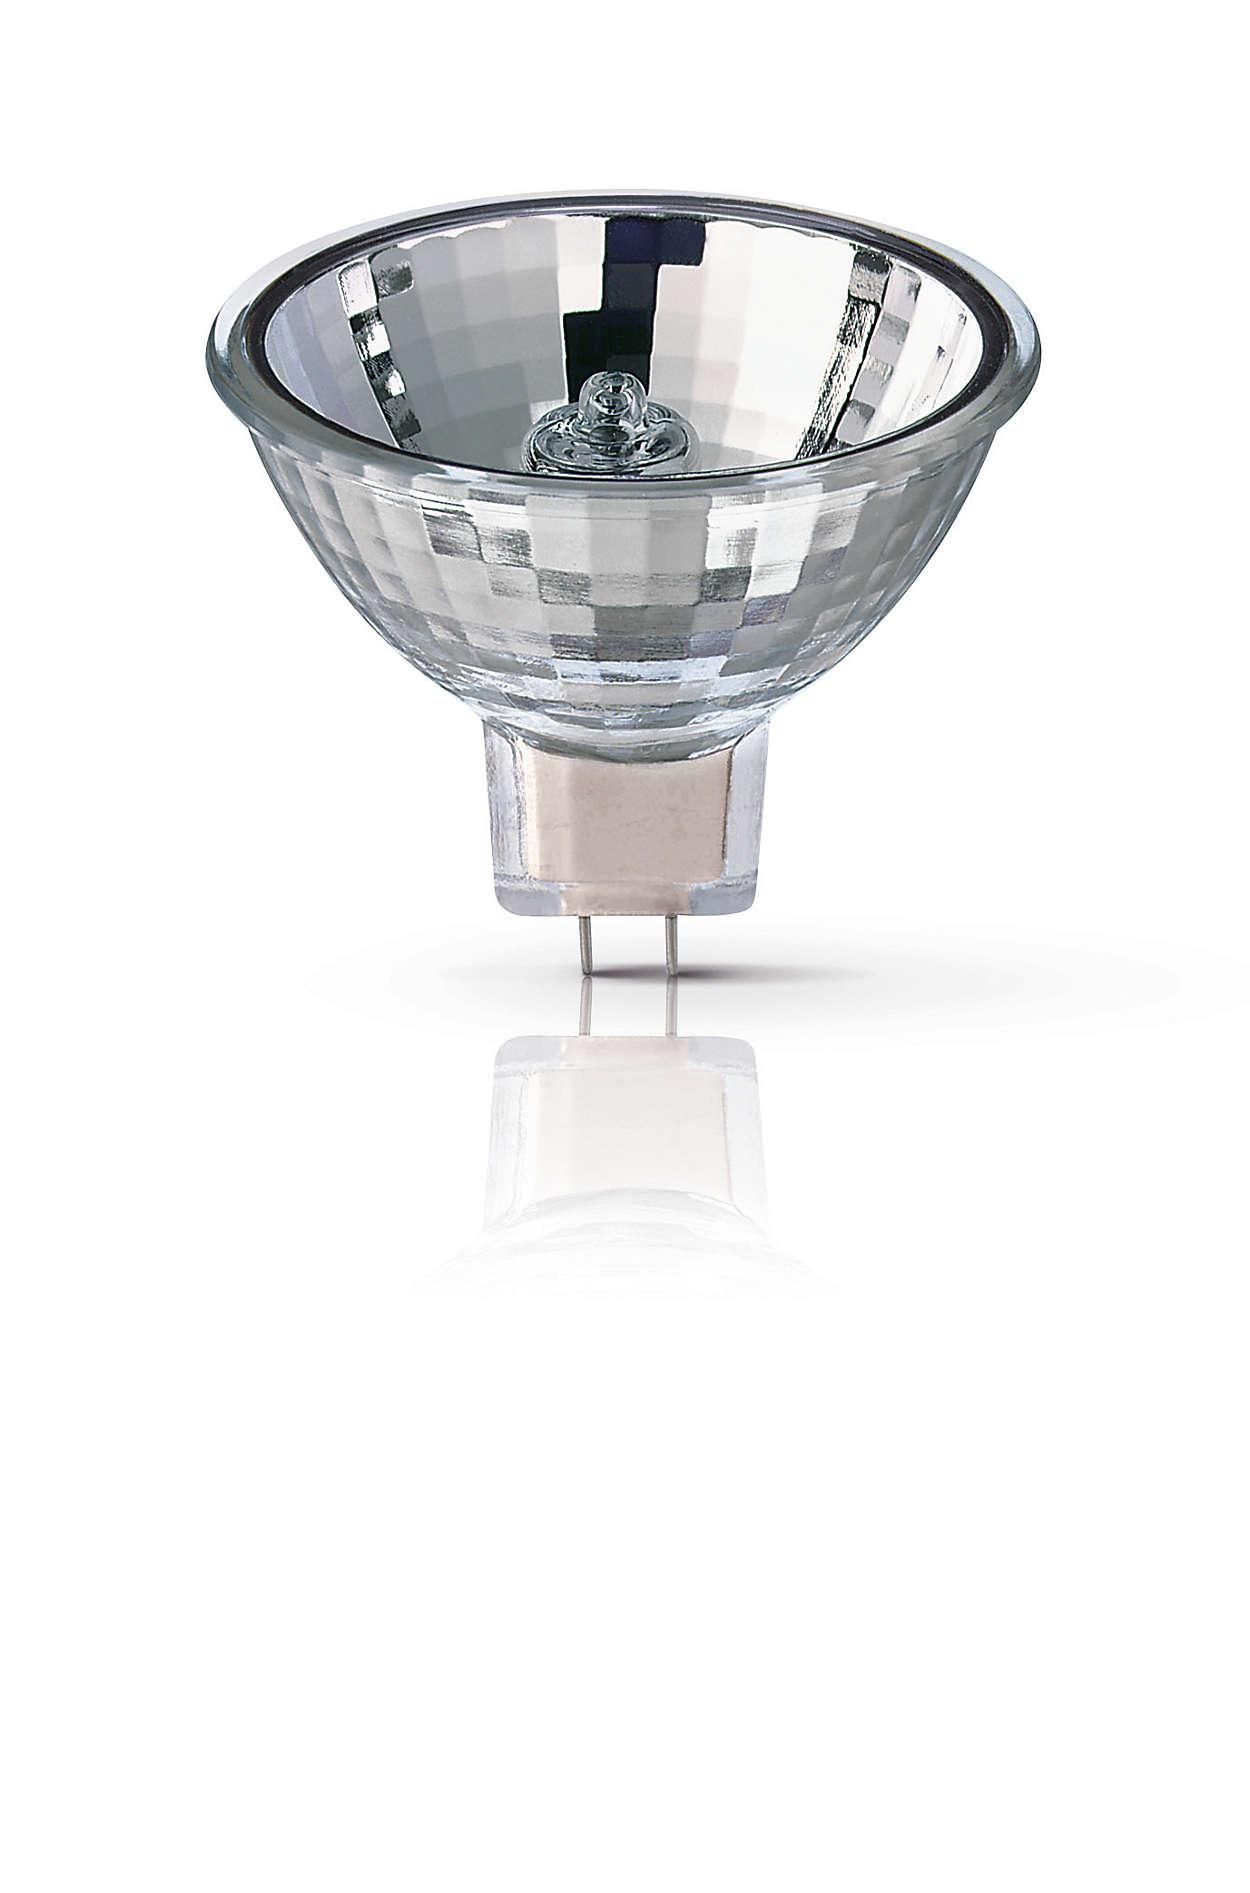 Halogen reflector lamps – proven reliability